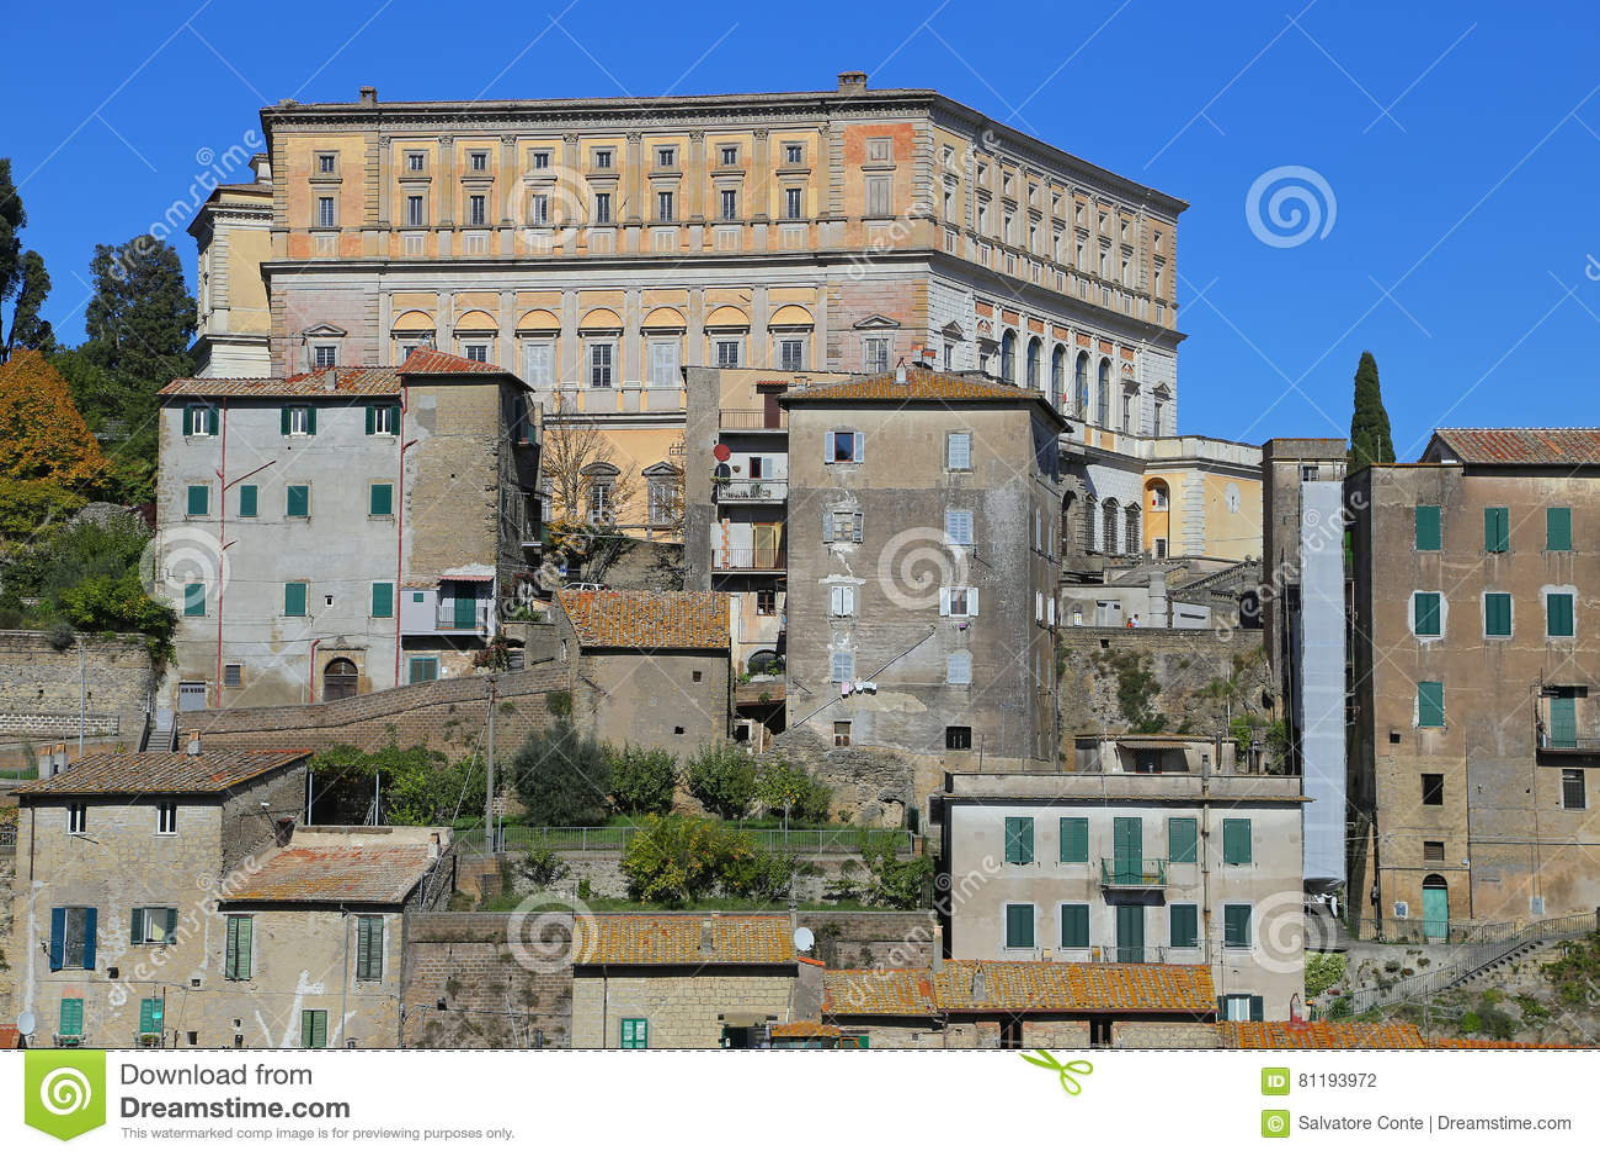 renaissance palazzo